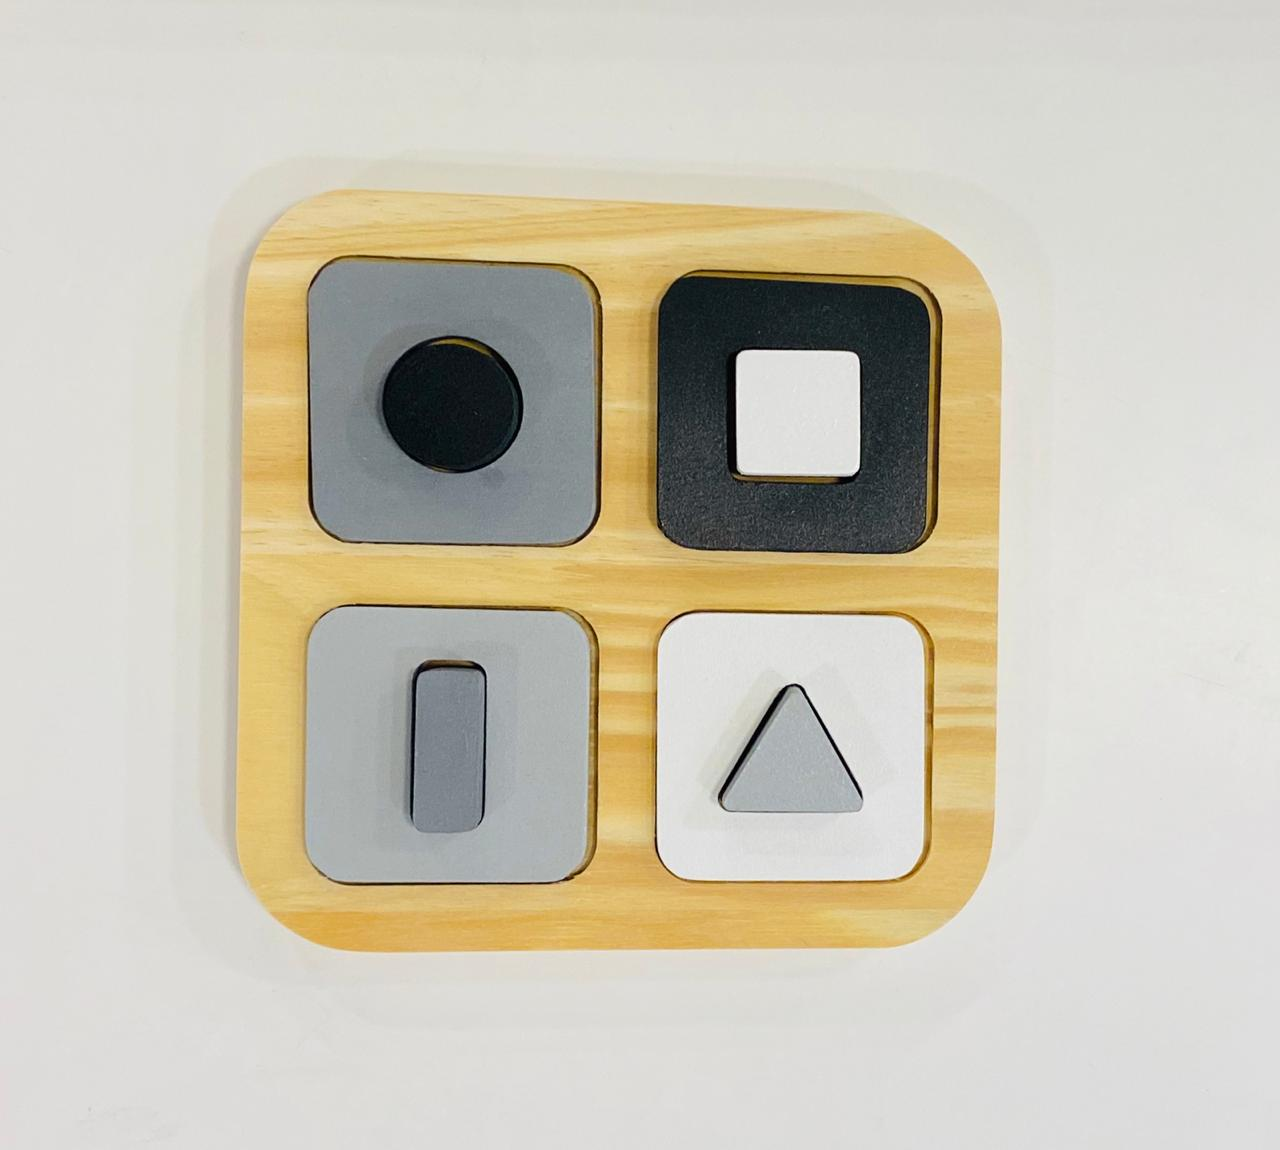 Tablero encastre figuras geometricas doble